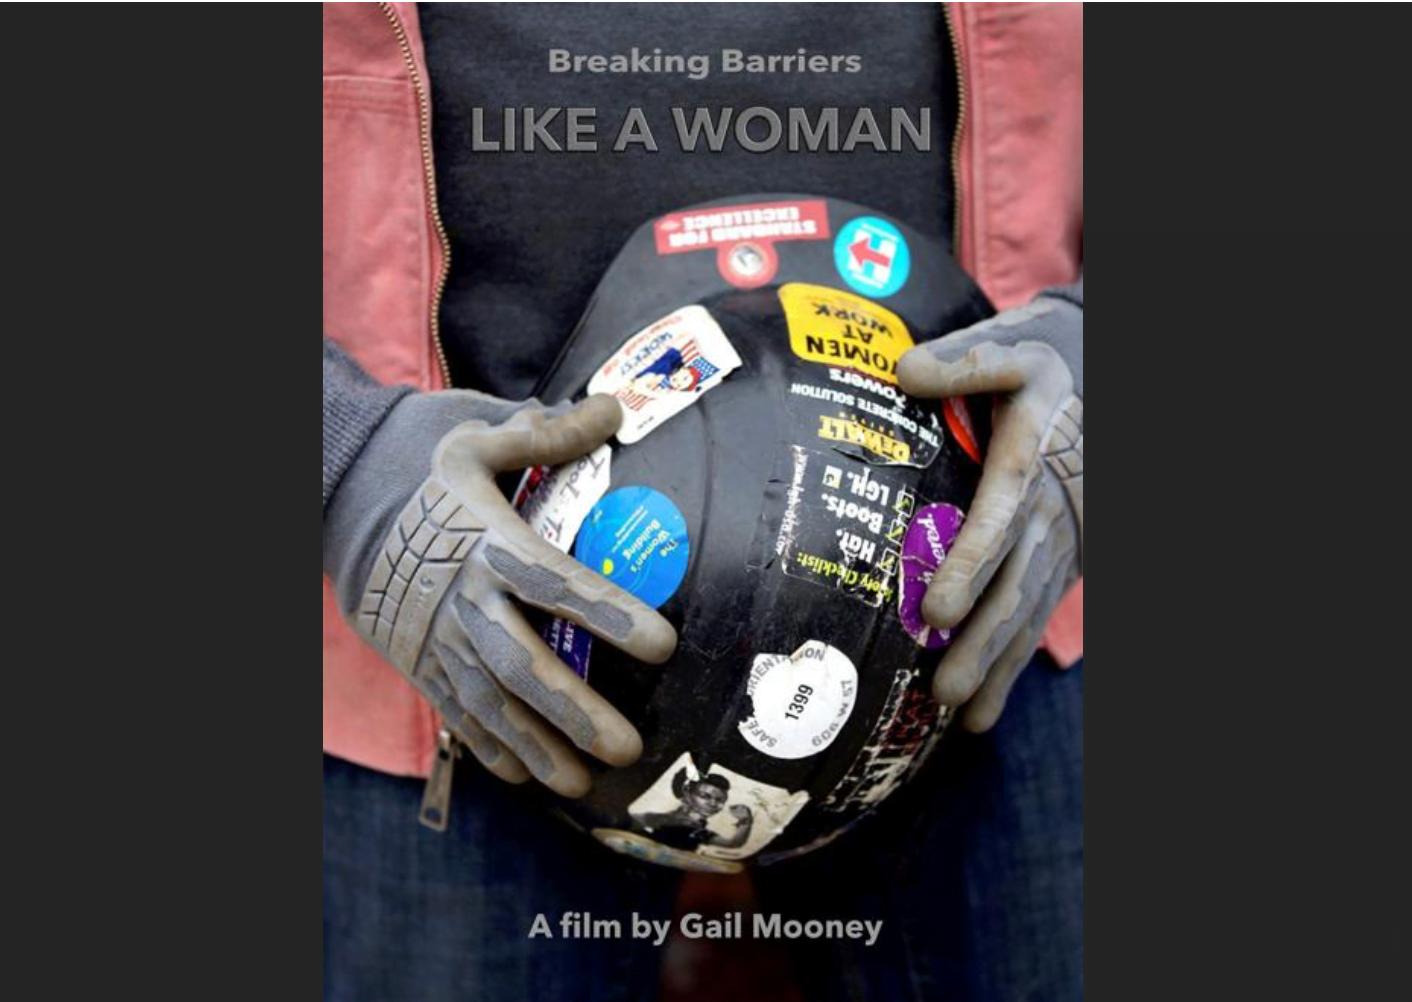 Breaking Barriers: Filmmaker Photographer Gail Mooney